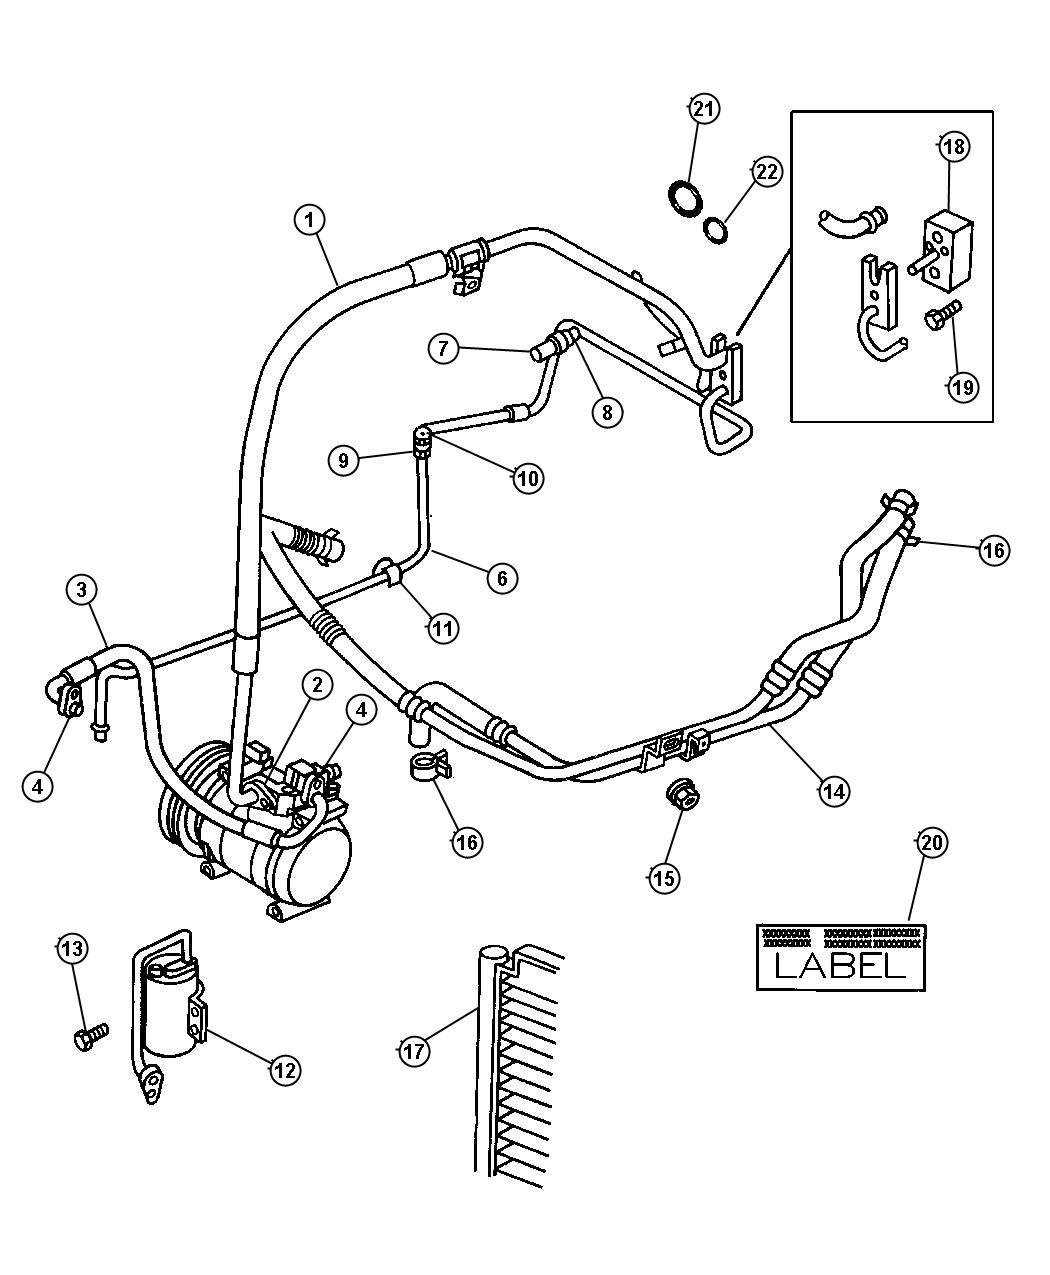 1995 jeep yj wiring diagram msd  jeep  auto wiring diagram